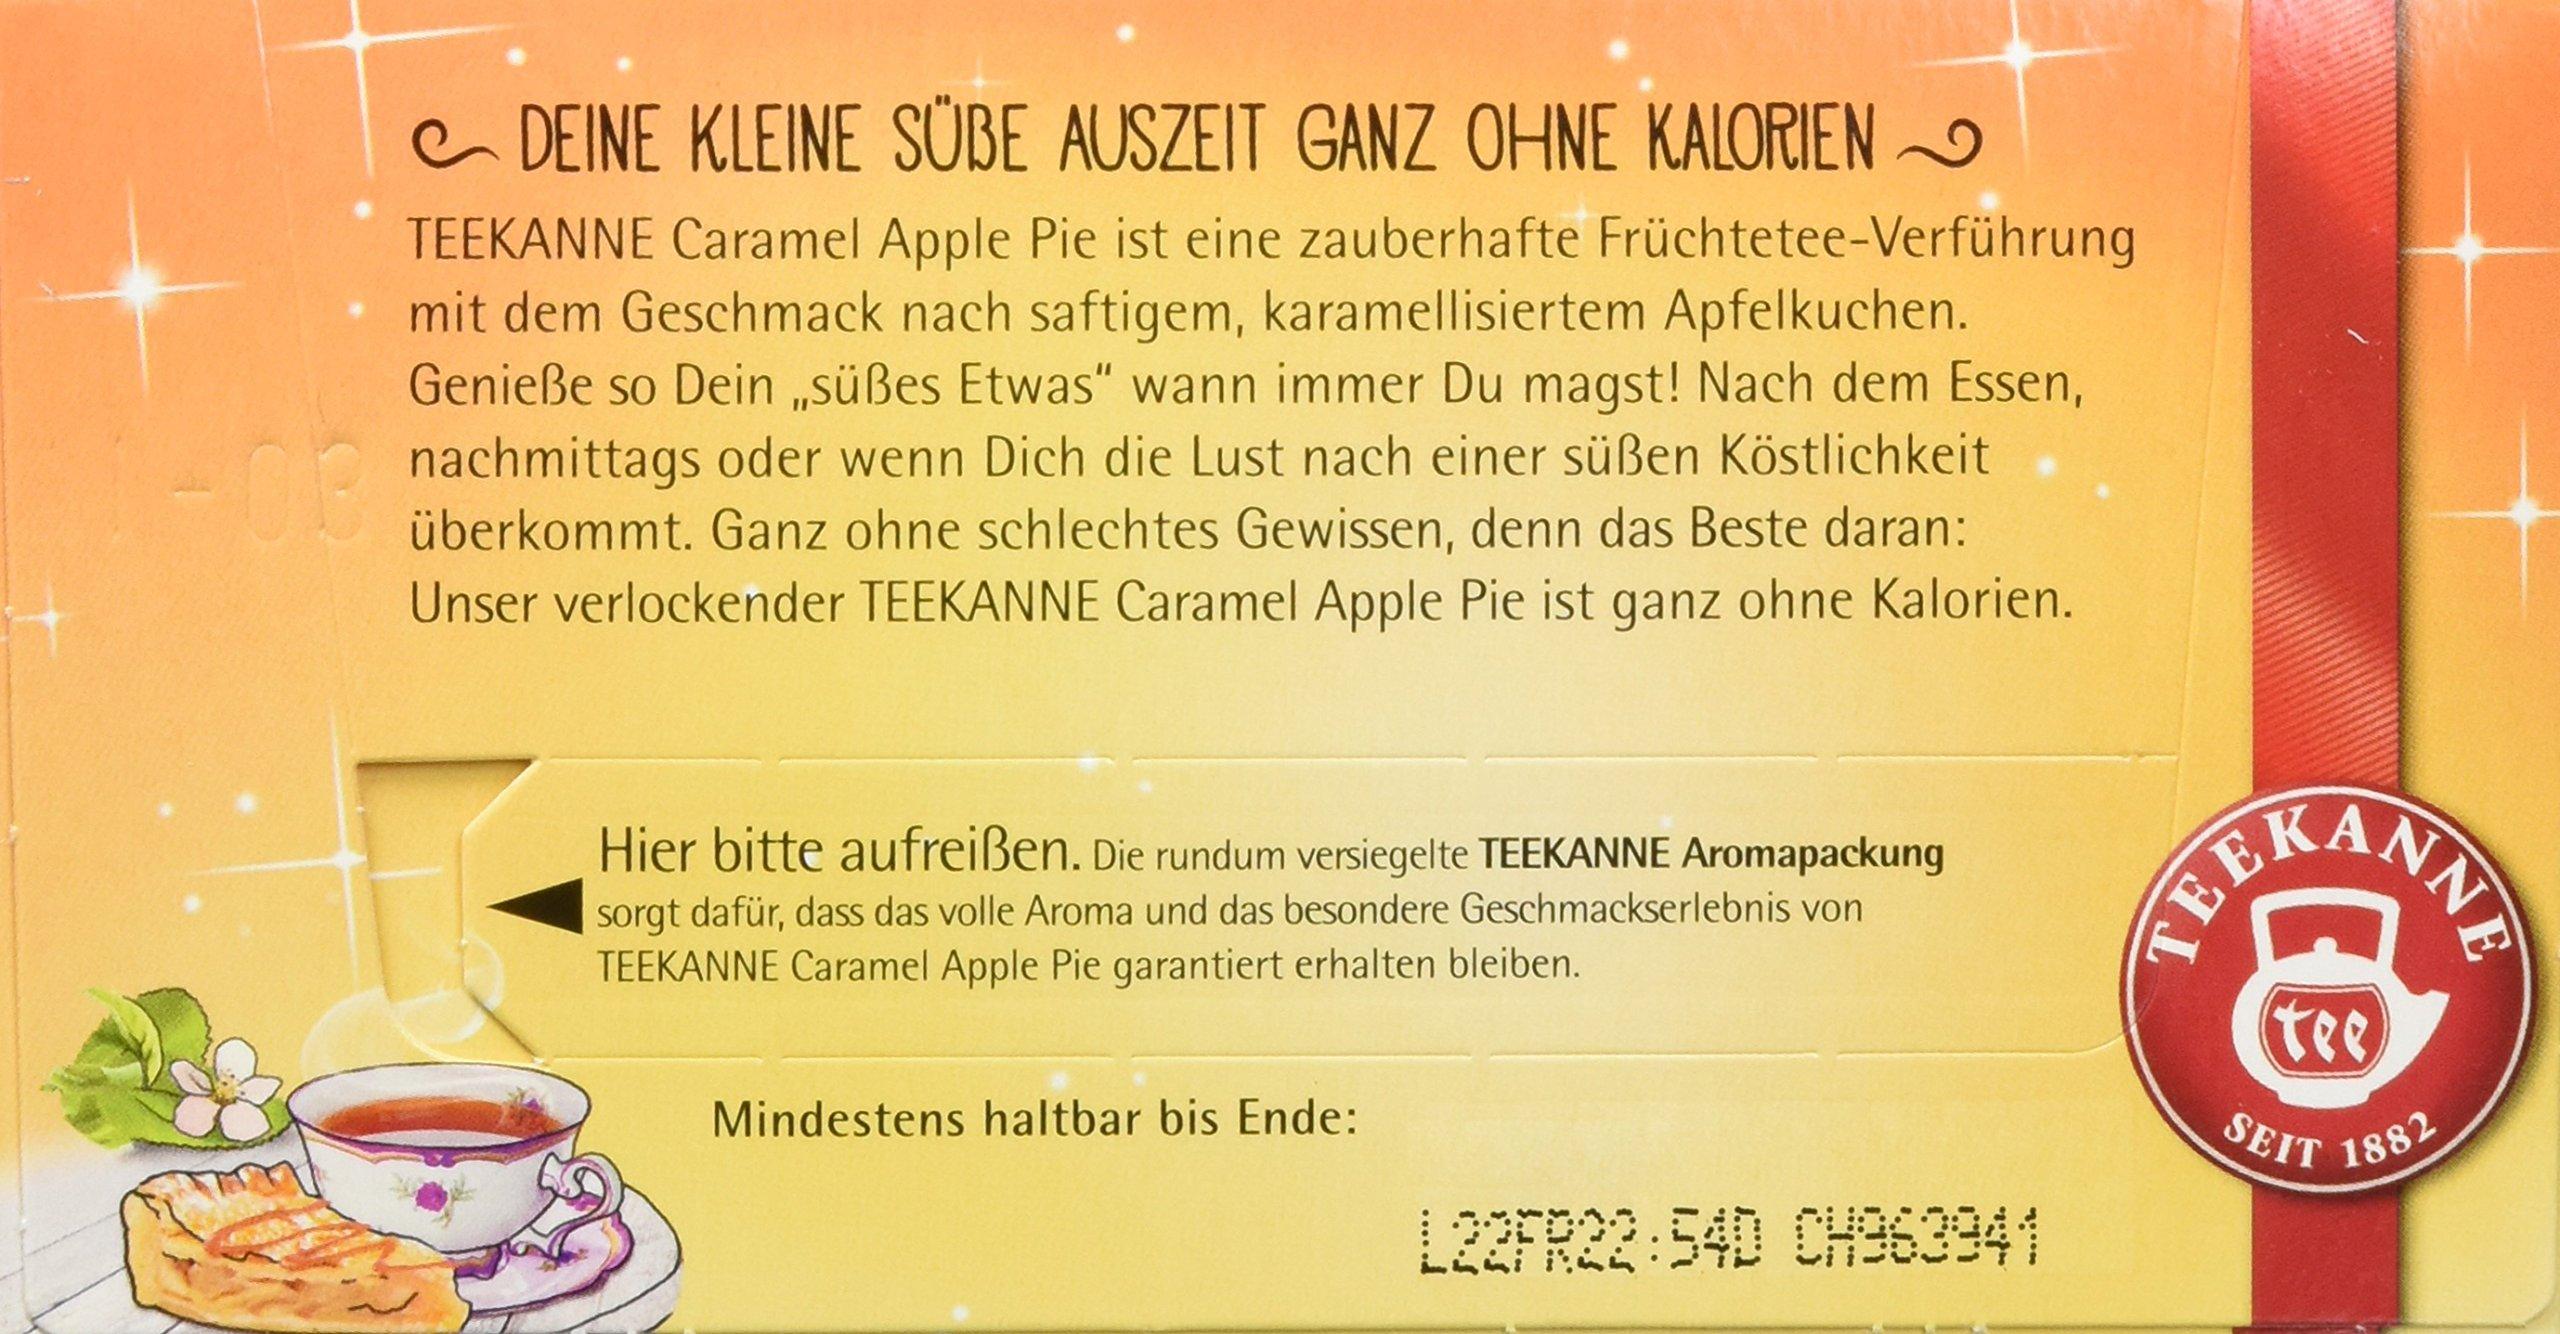 Teekanne-Caramel-Apple-Pie-12er-Pack-12-x-41-g